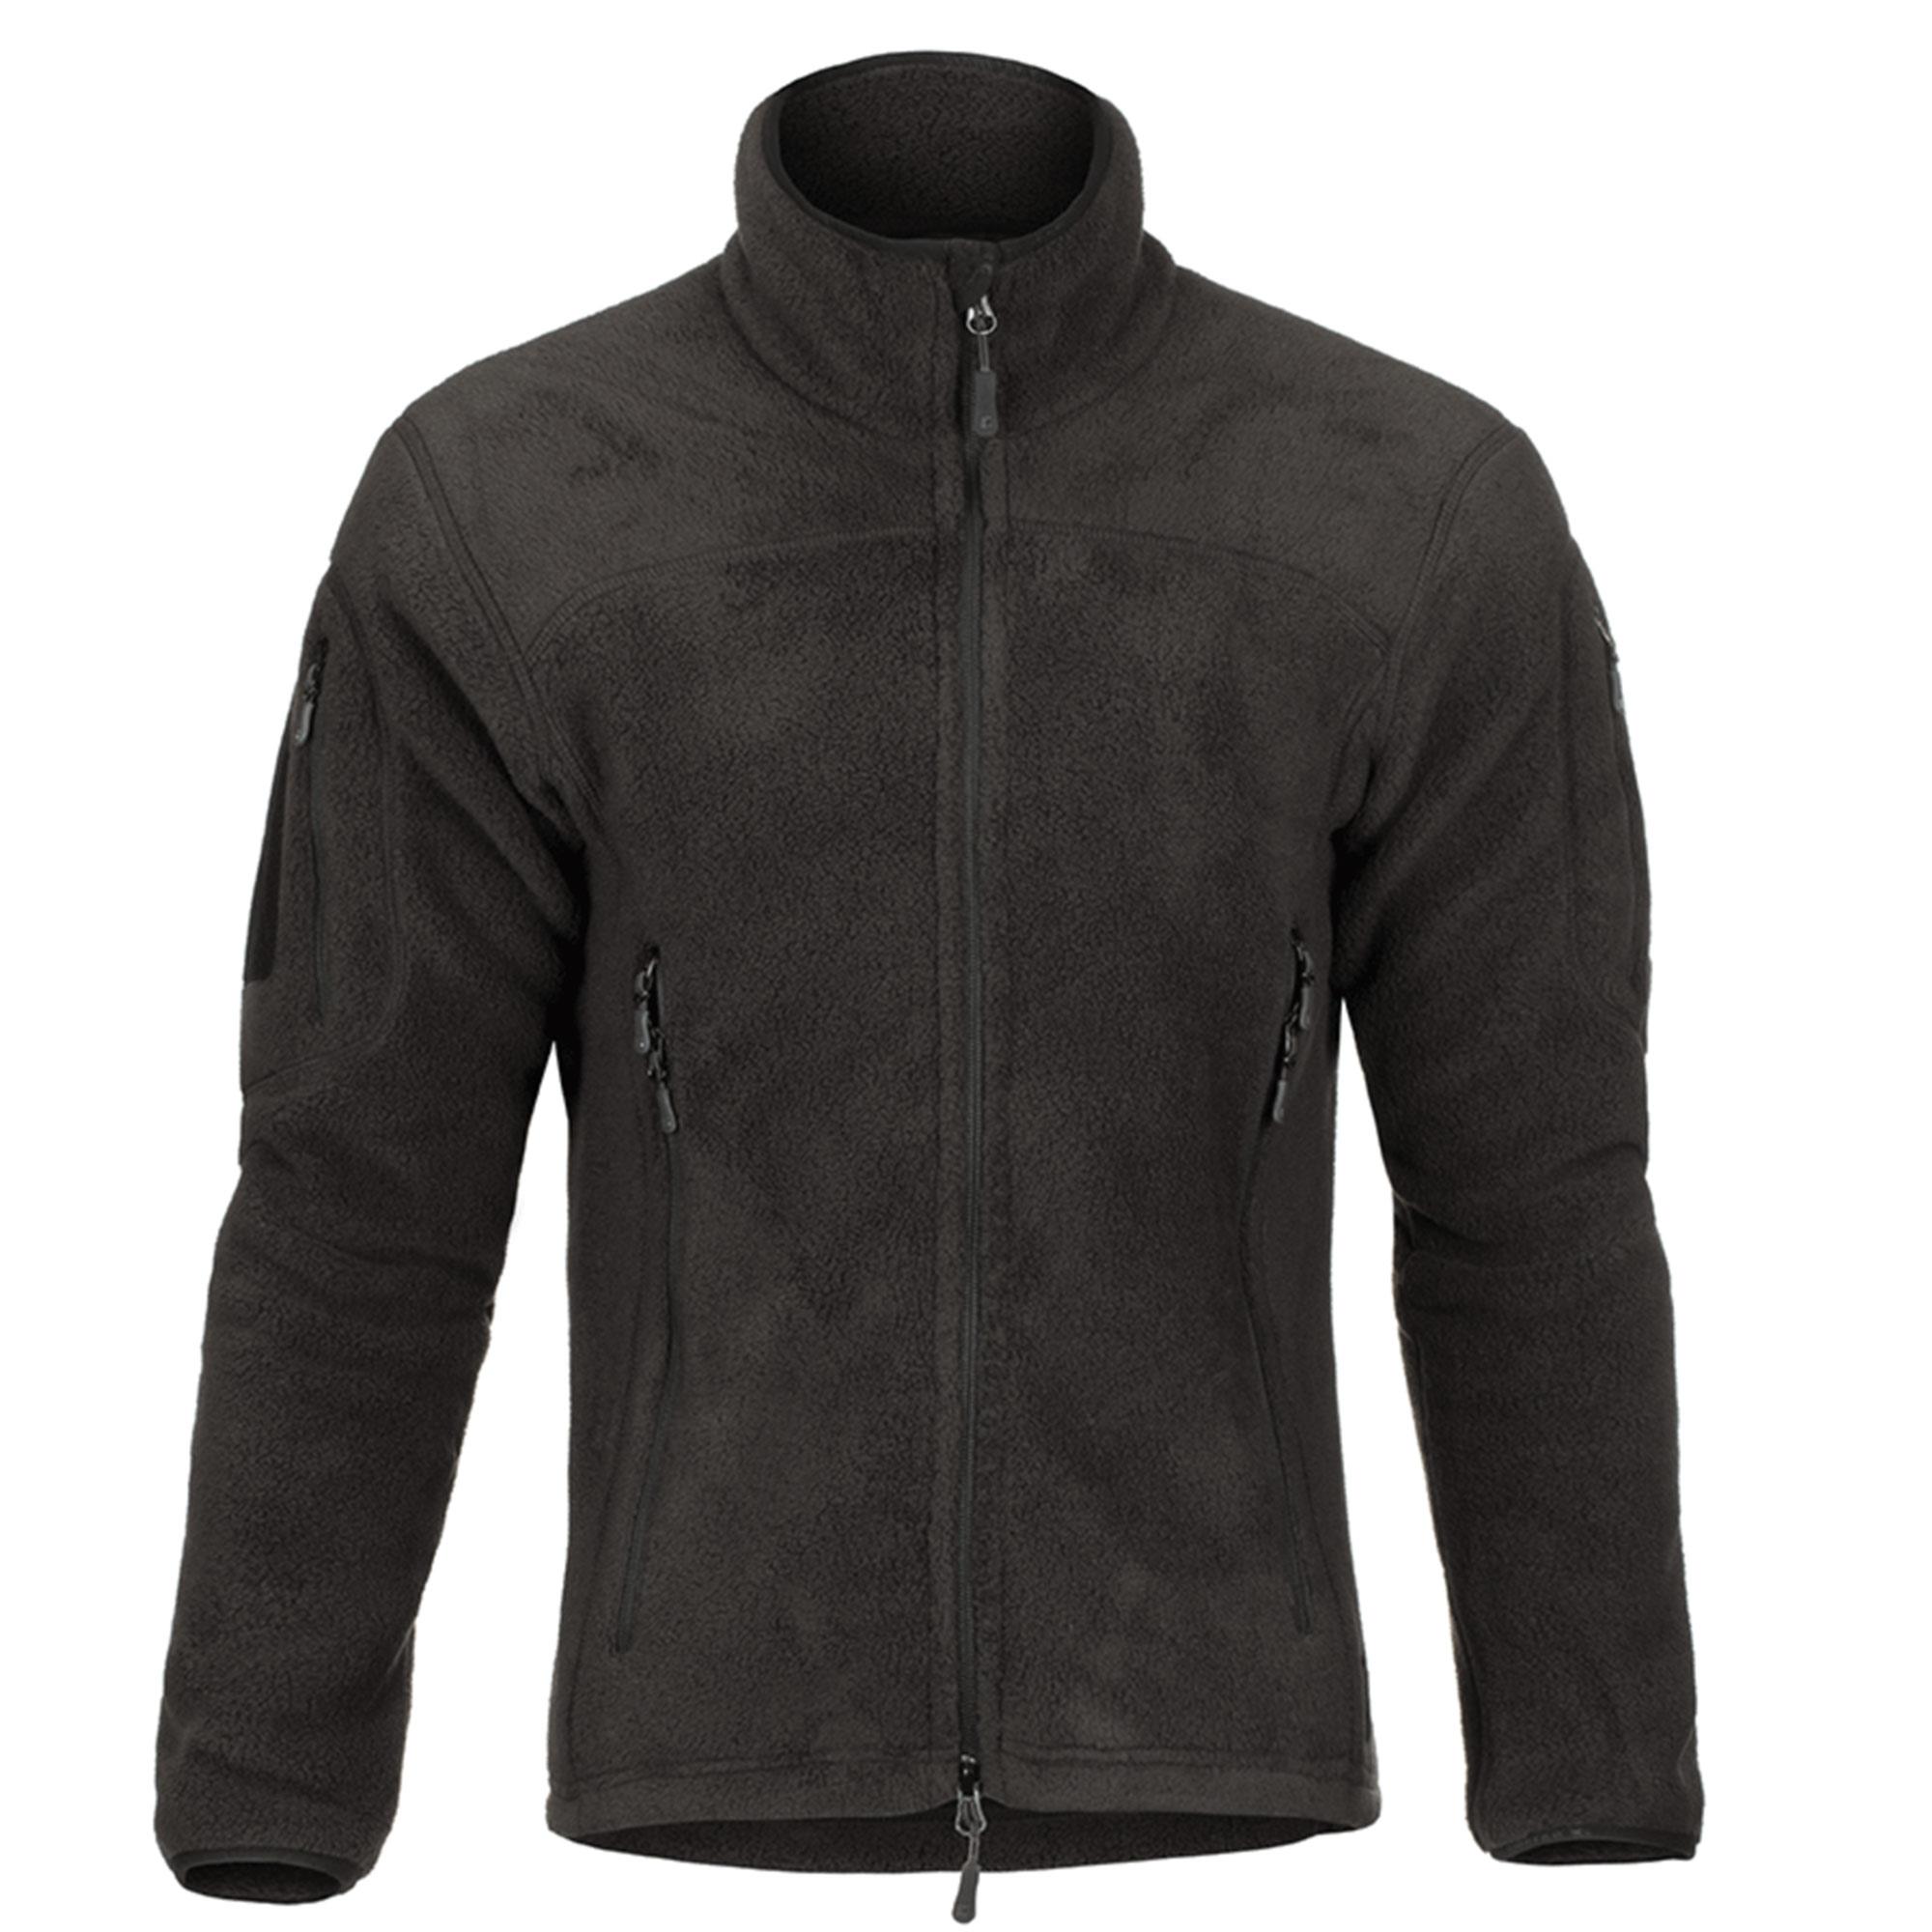 ClawGear Fleece Jacket Milvago black